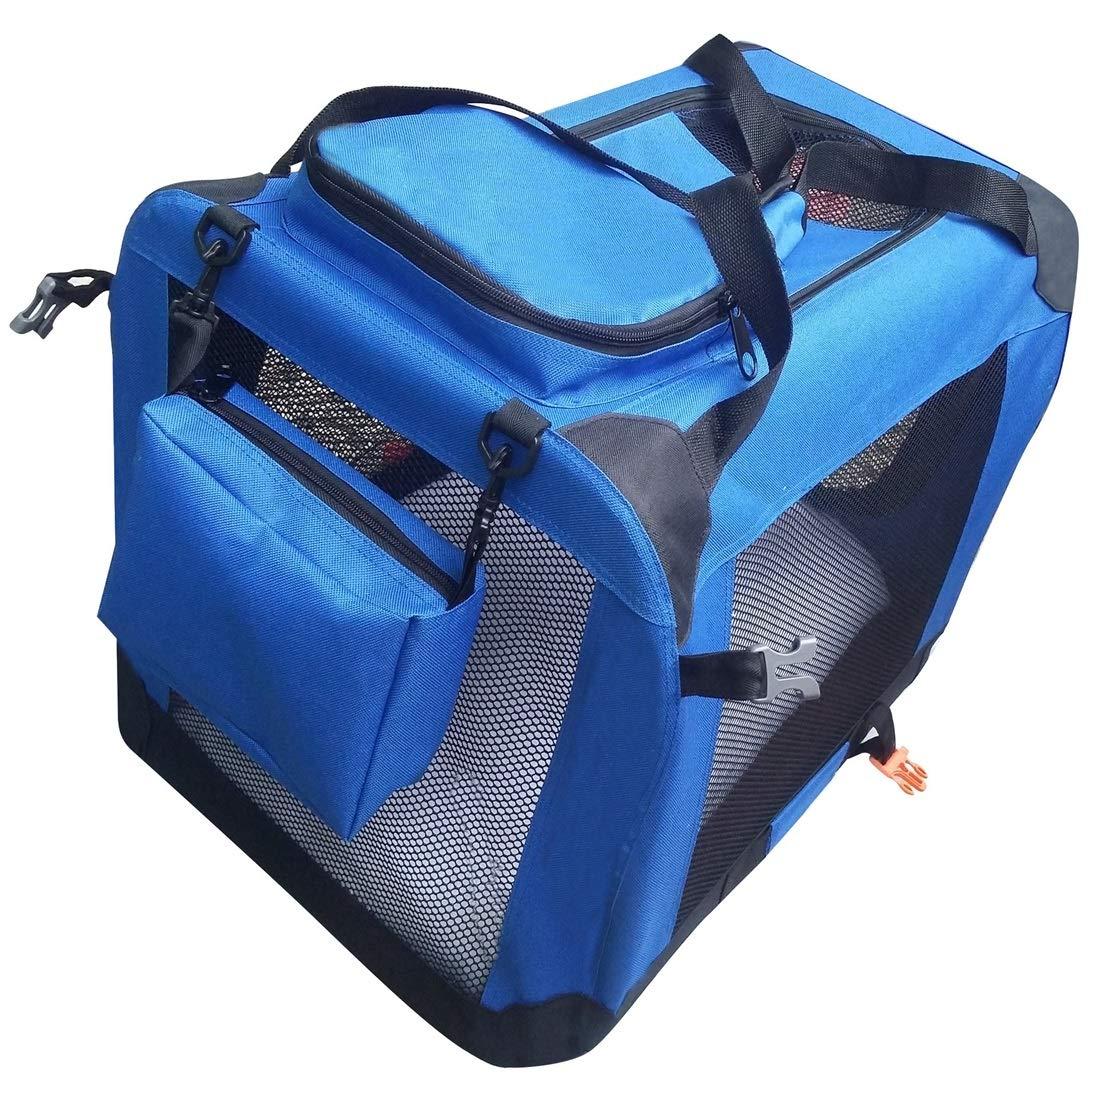 bluee 50X30X35cm bluee 50X30X35cm HUAyue Pet Bag Foldaway Pet Bag Portable Pet Bag Disassembly Car Bag (color   bluee, Size   50X30X35cm)